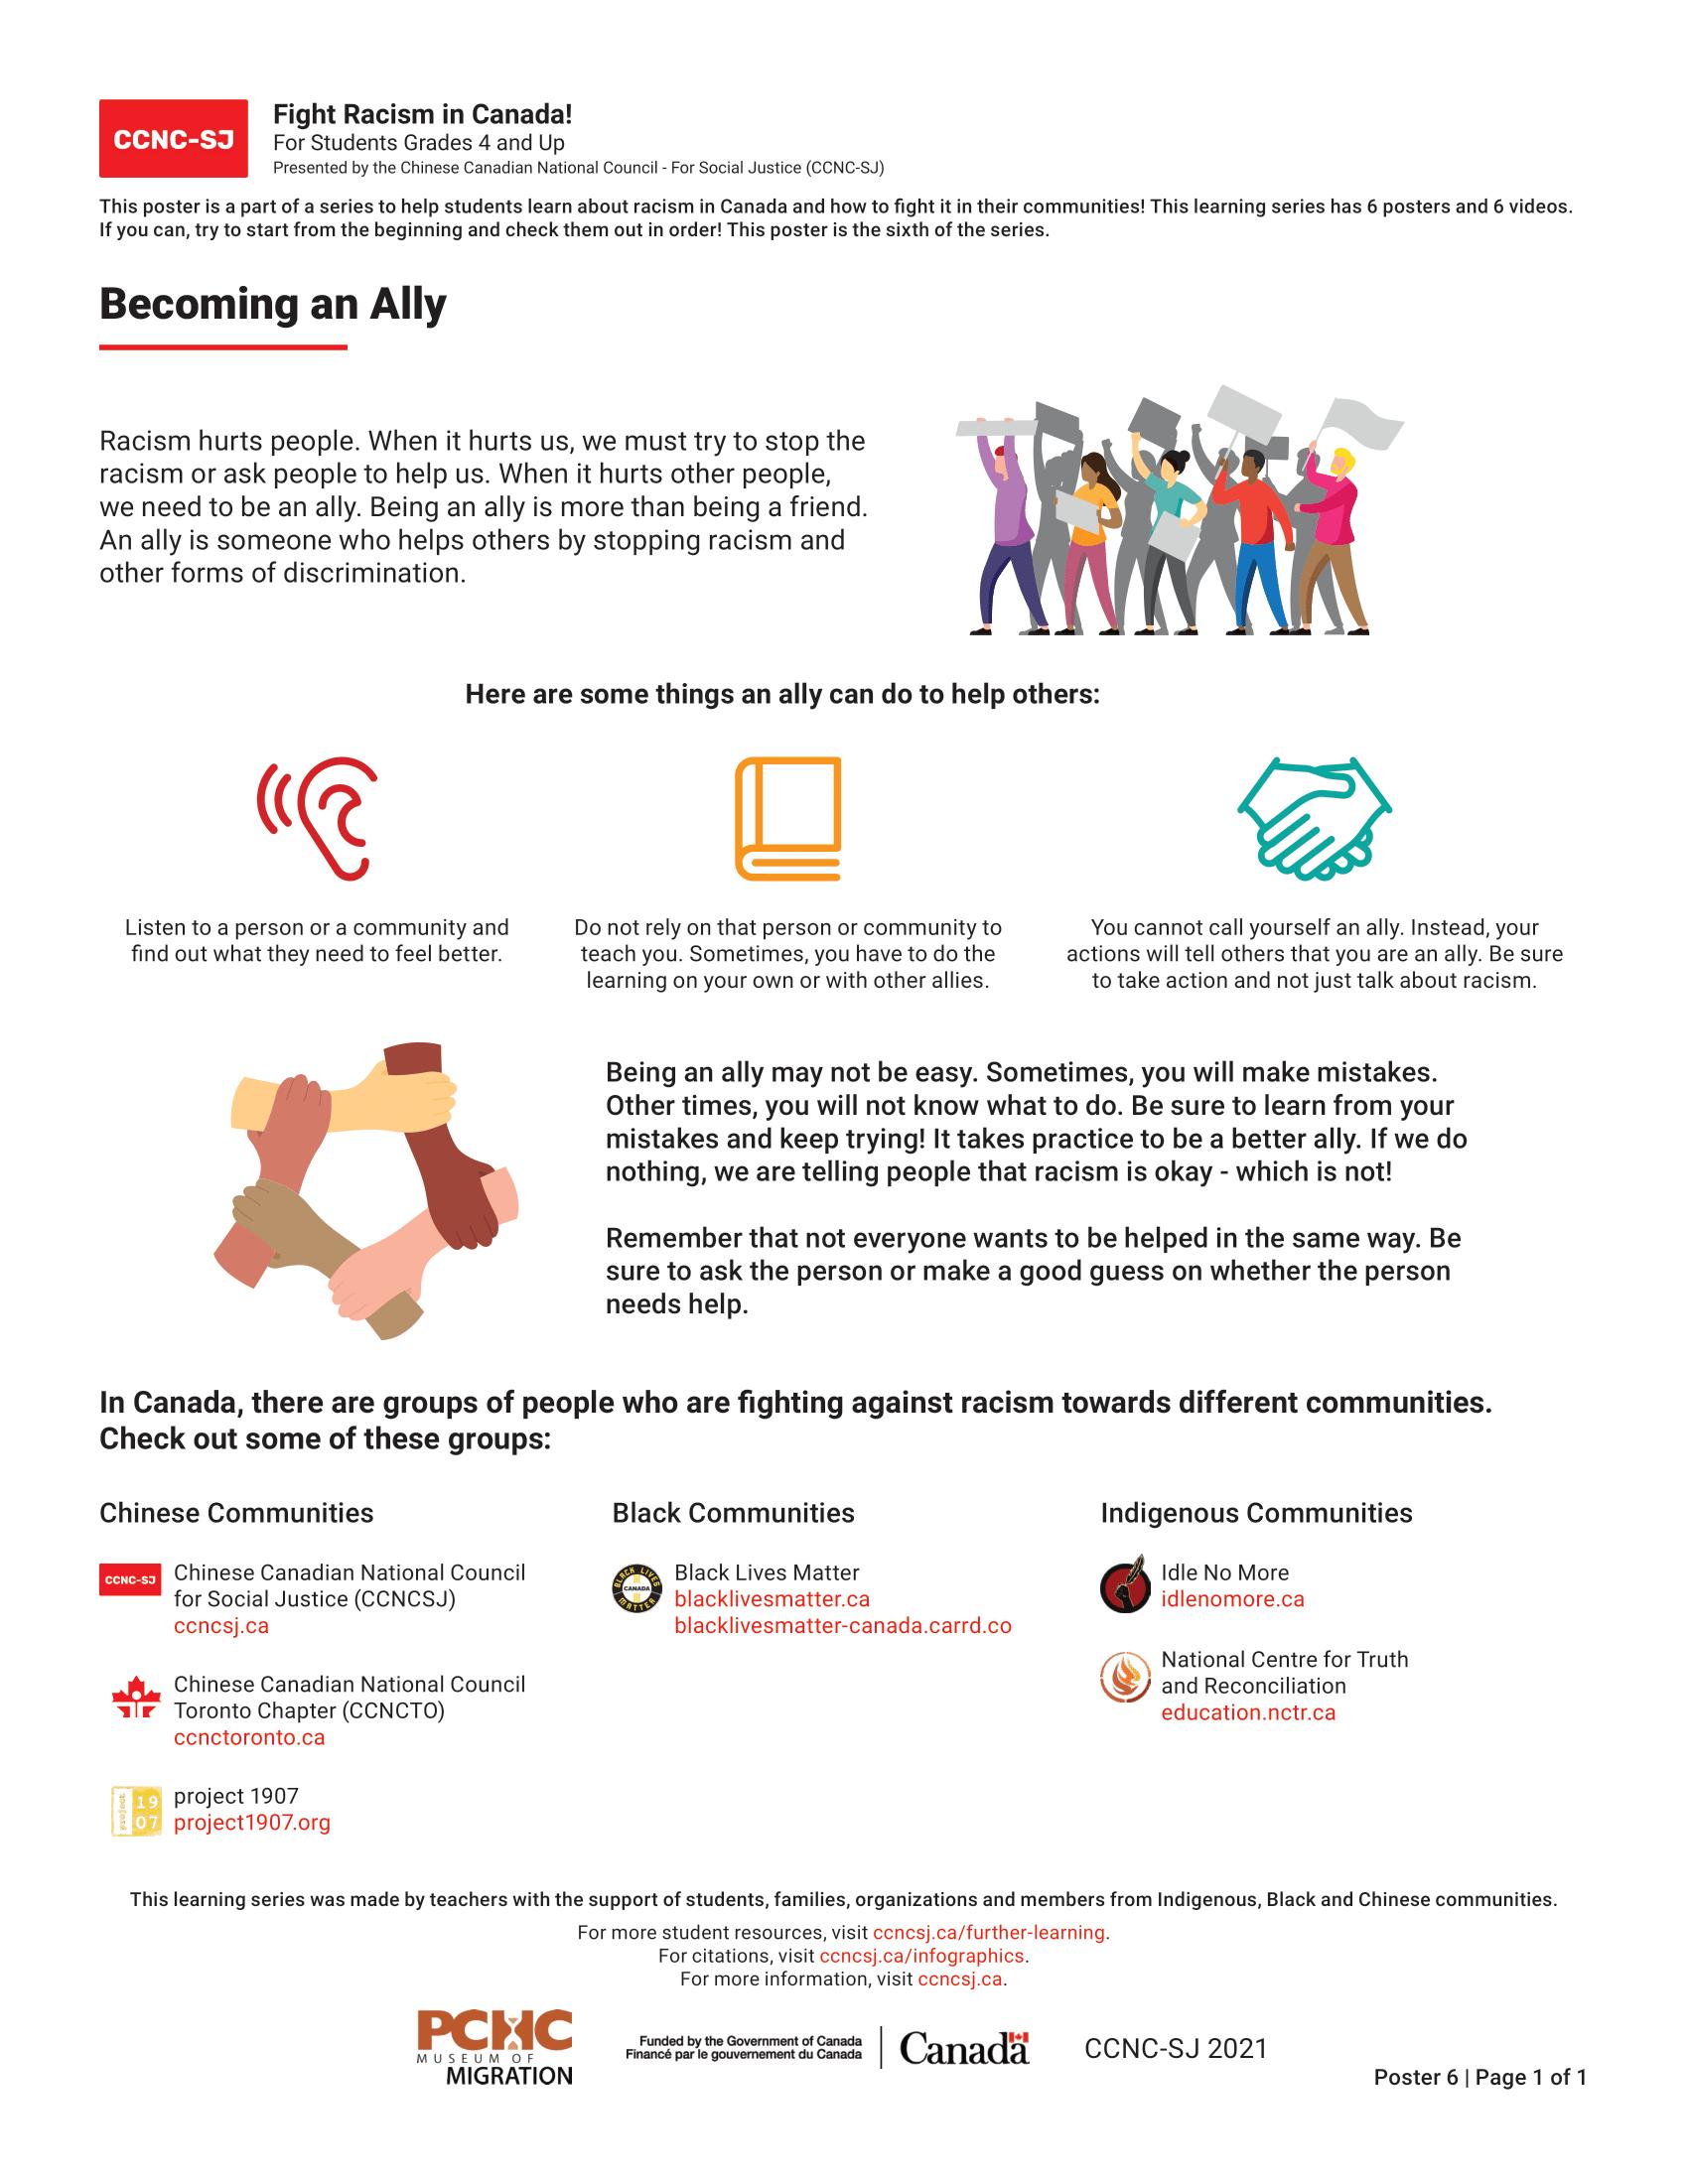 CCNC-SJ-Resource-Poster 6